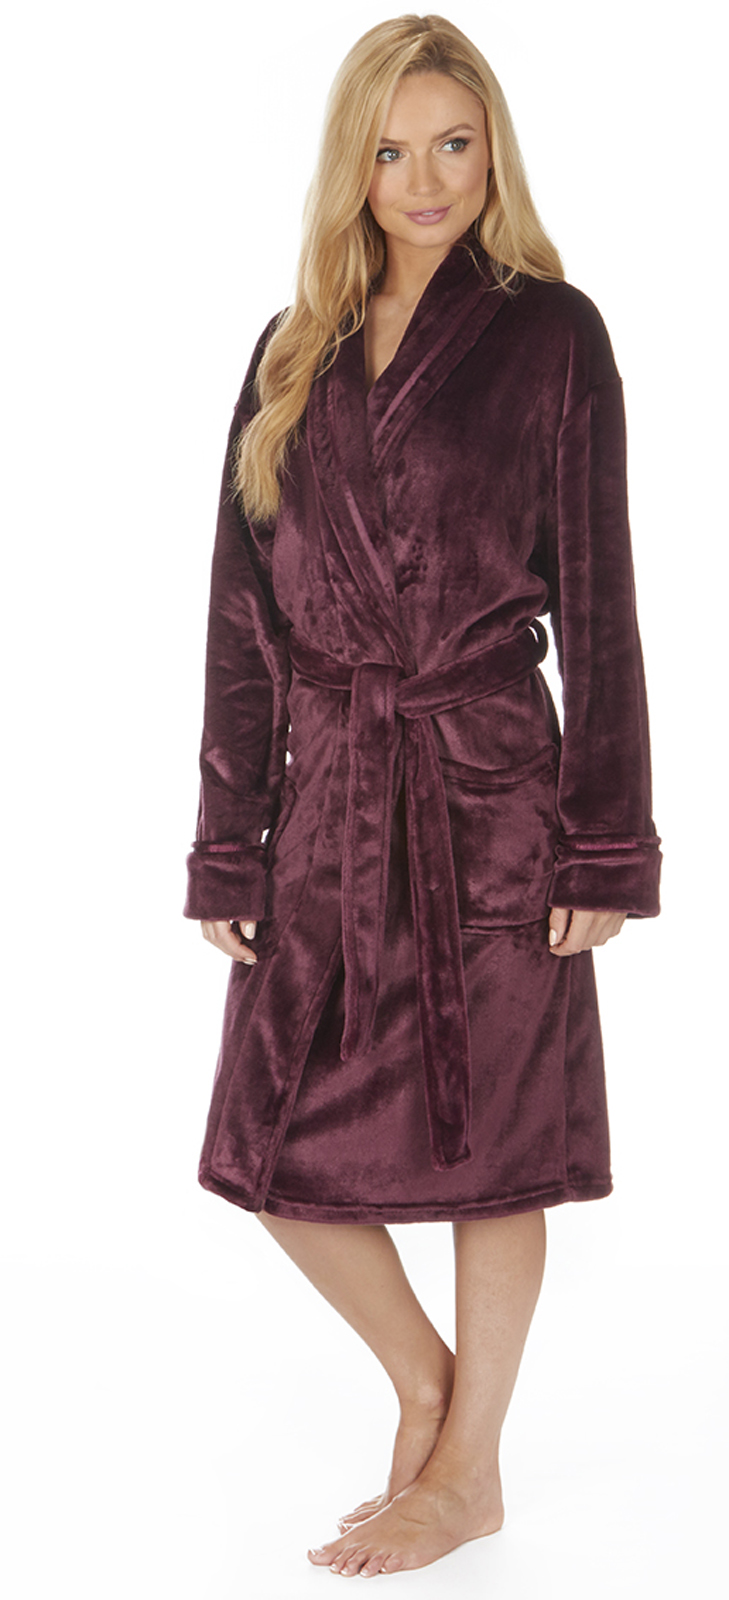 Luxury Womens Plus Size Flannel Fleece Dressing Gown Full Length ... e073dc7b29